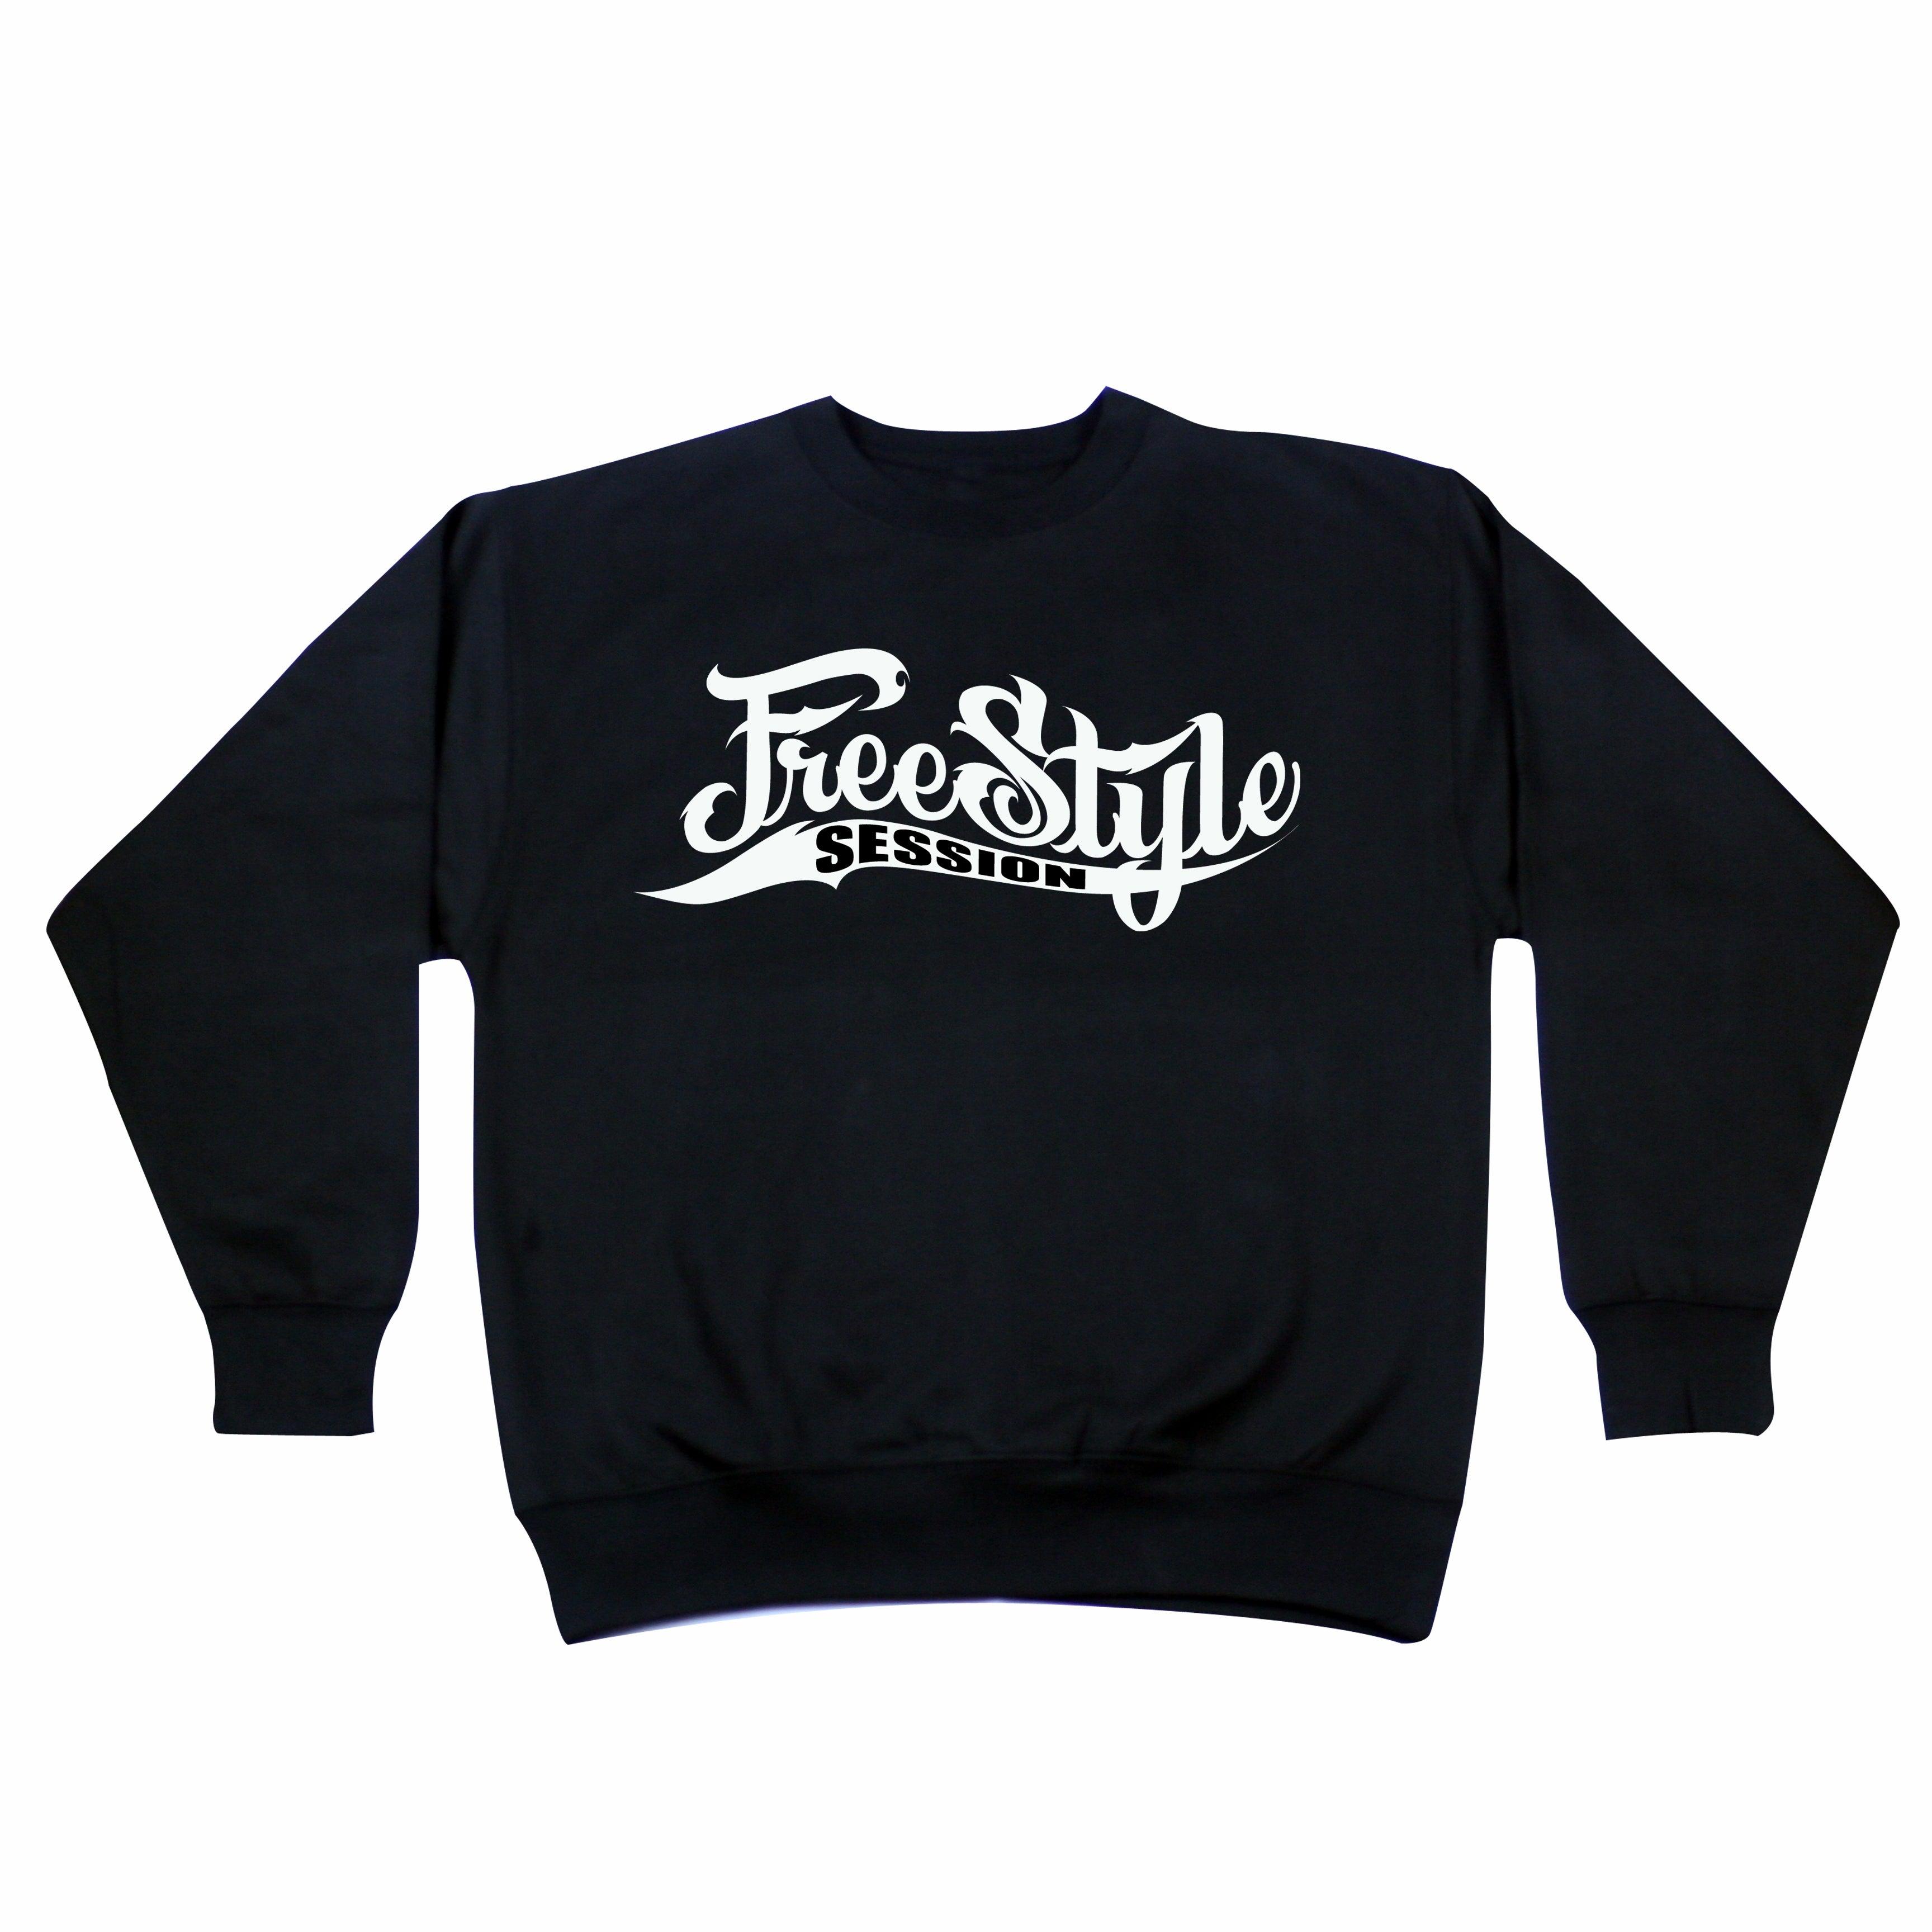 Freestyle Session Crewneck Black Sweater